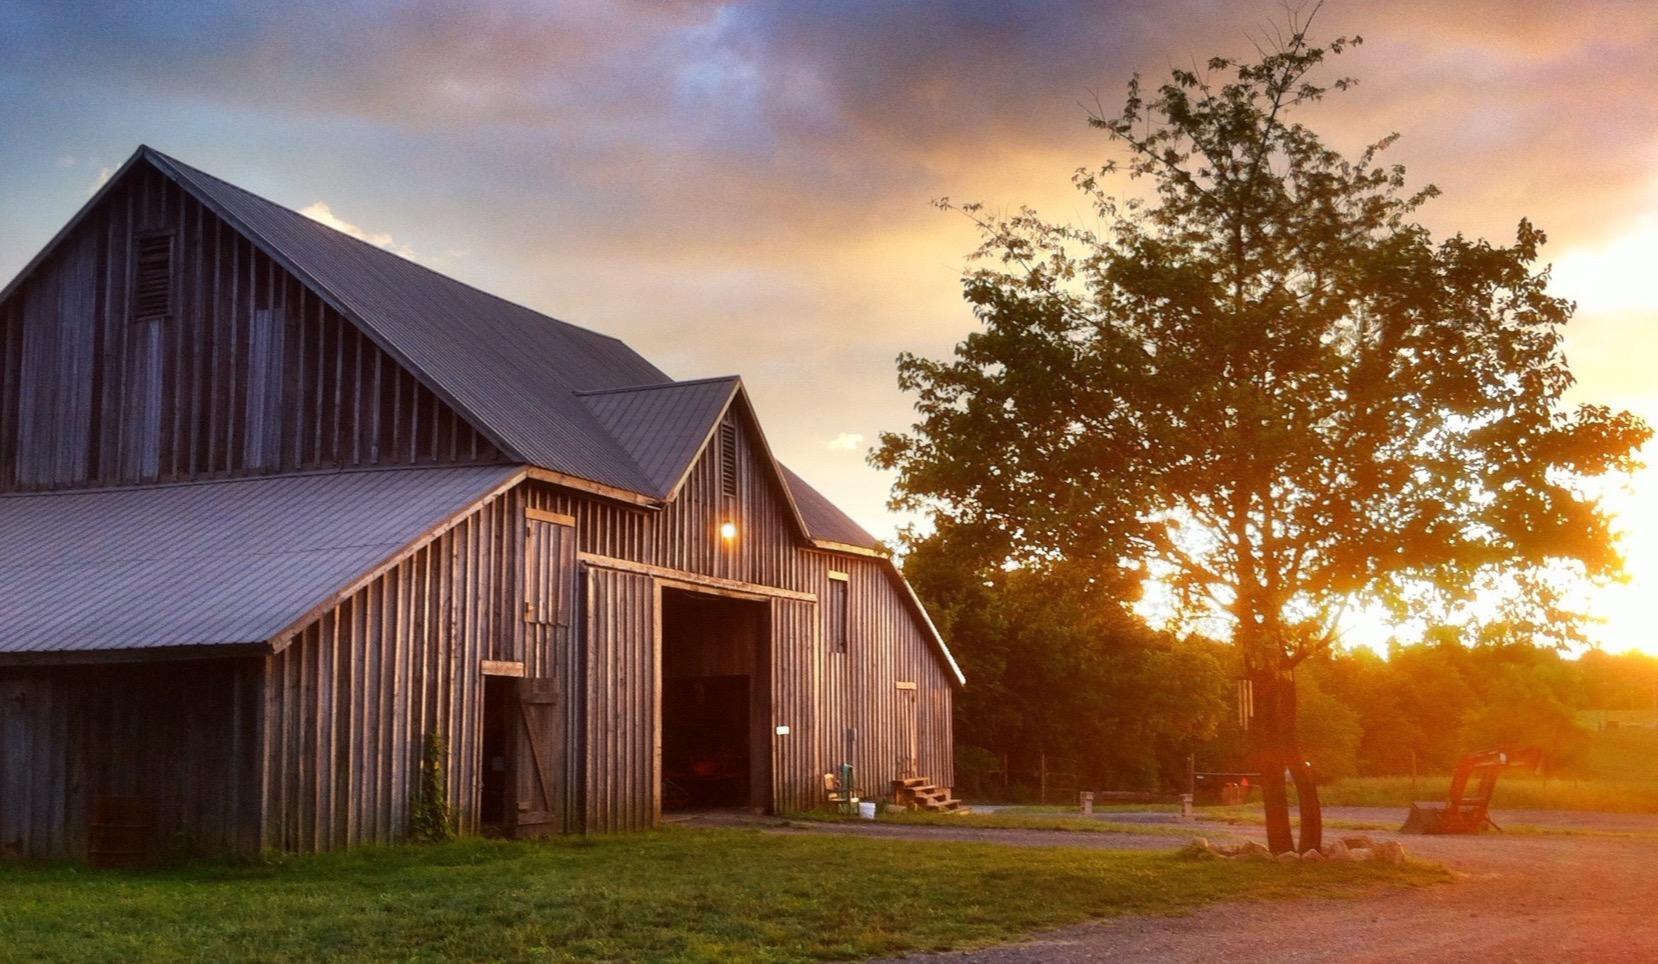 Uploaded by Gorman Farms / CSA